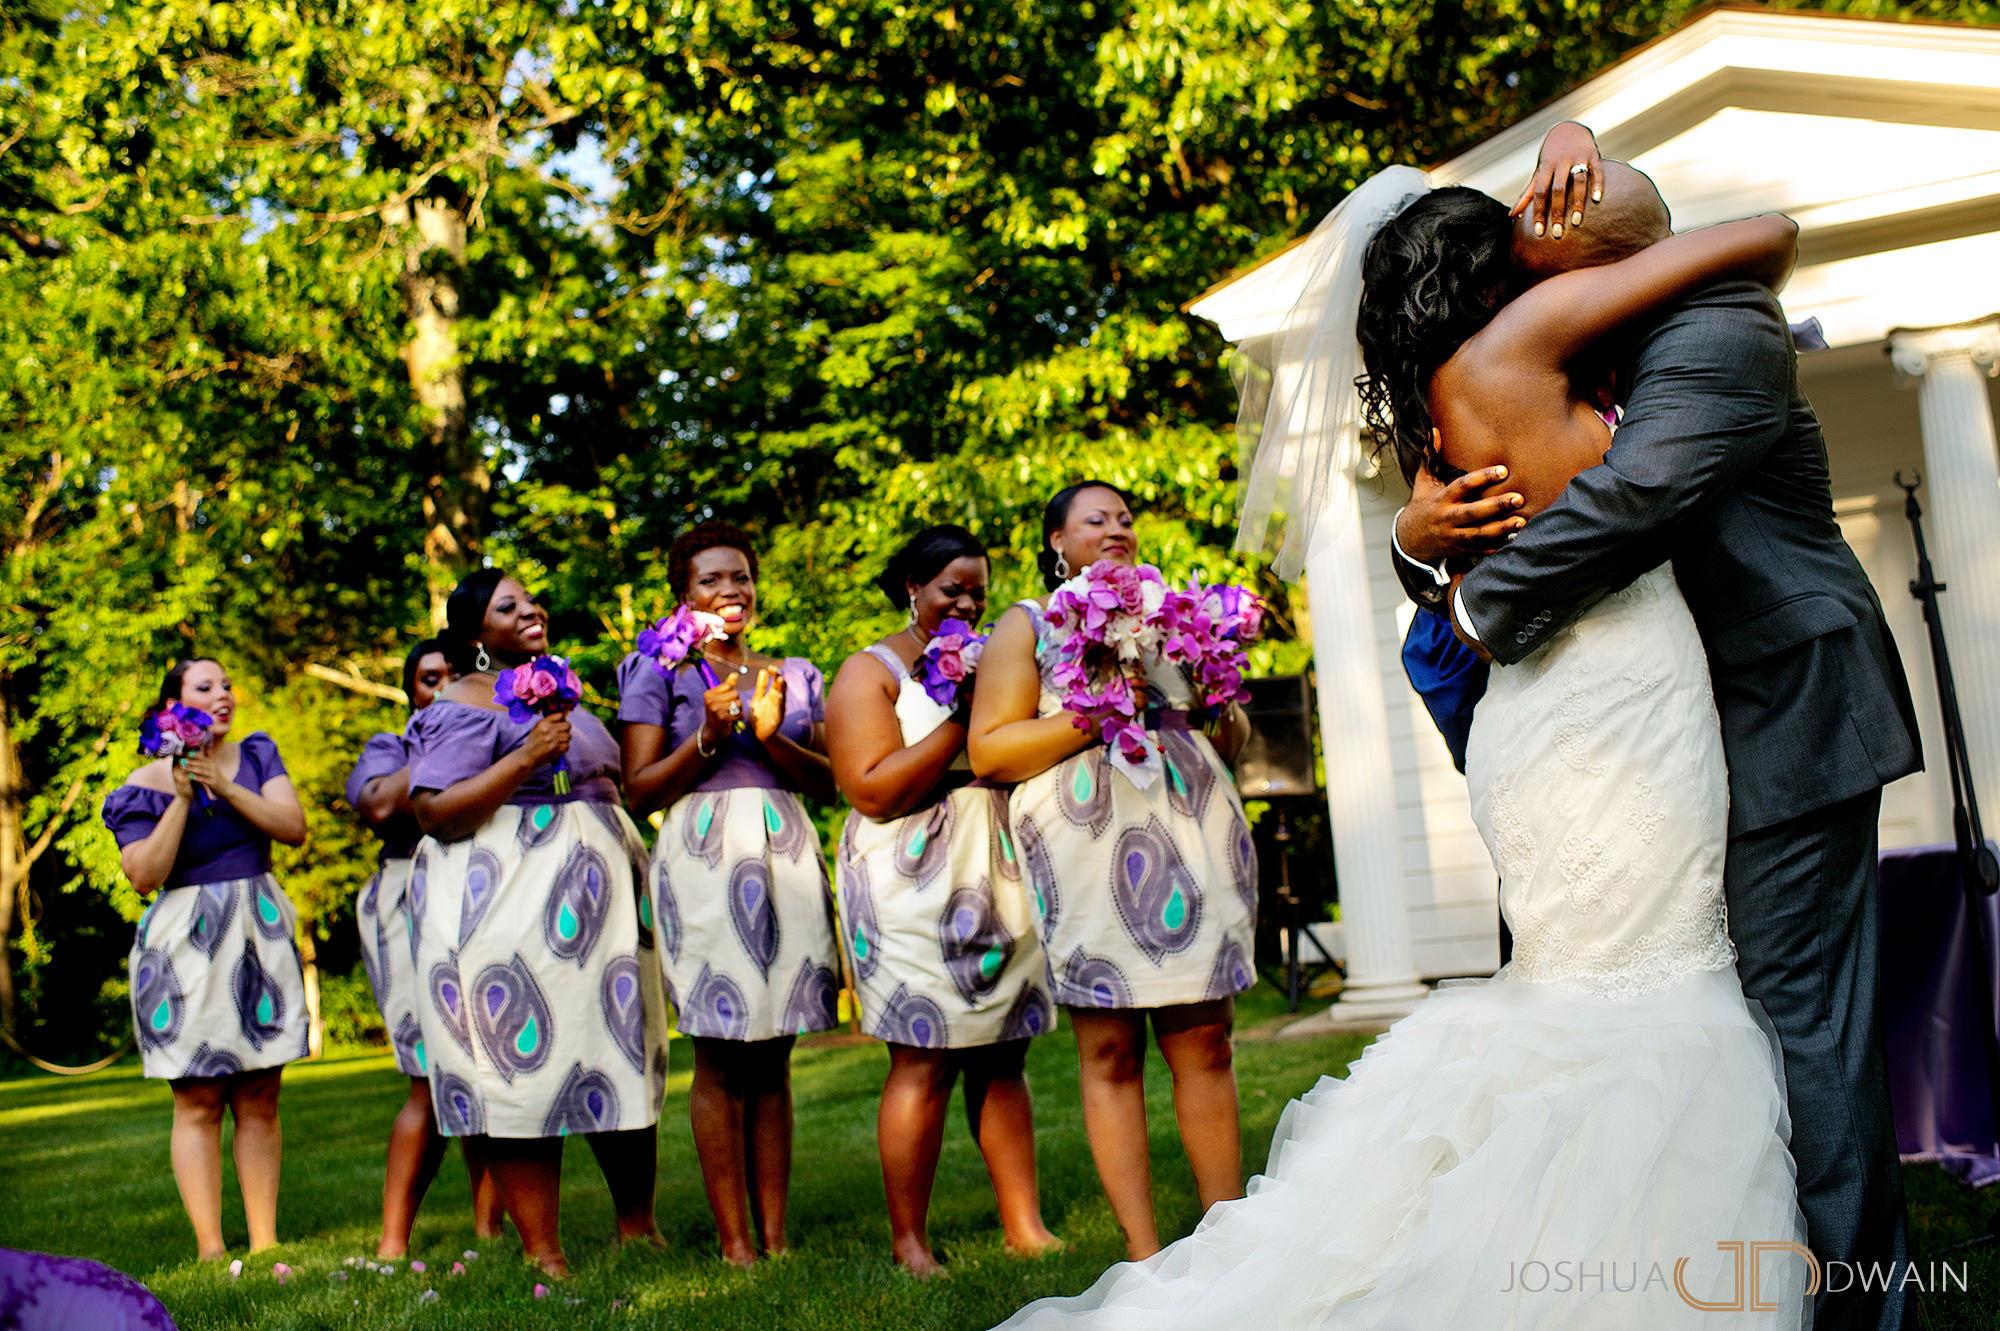 nancy-jason-013-wadsworth-estates-middletown-ct-wedding-photographer-joshua-dwain-photography-